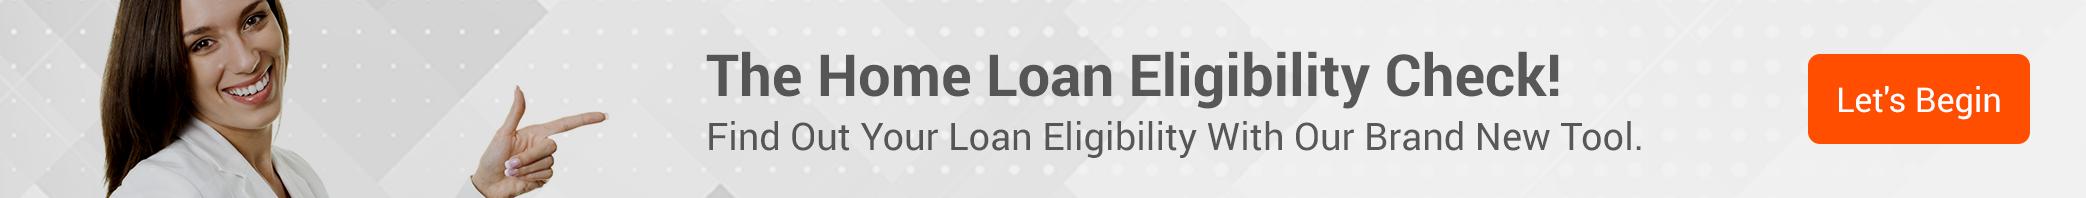 Home loan eligibility widget